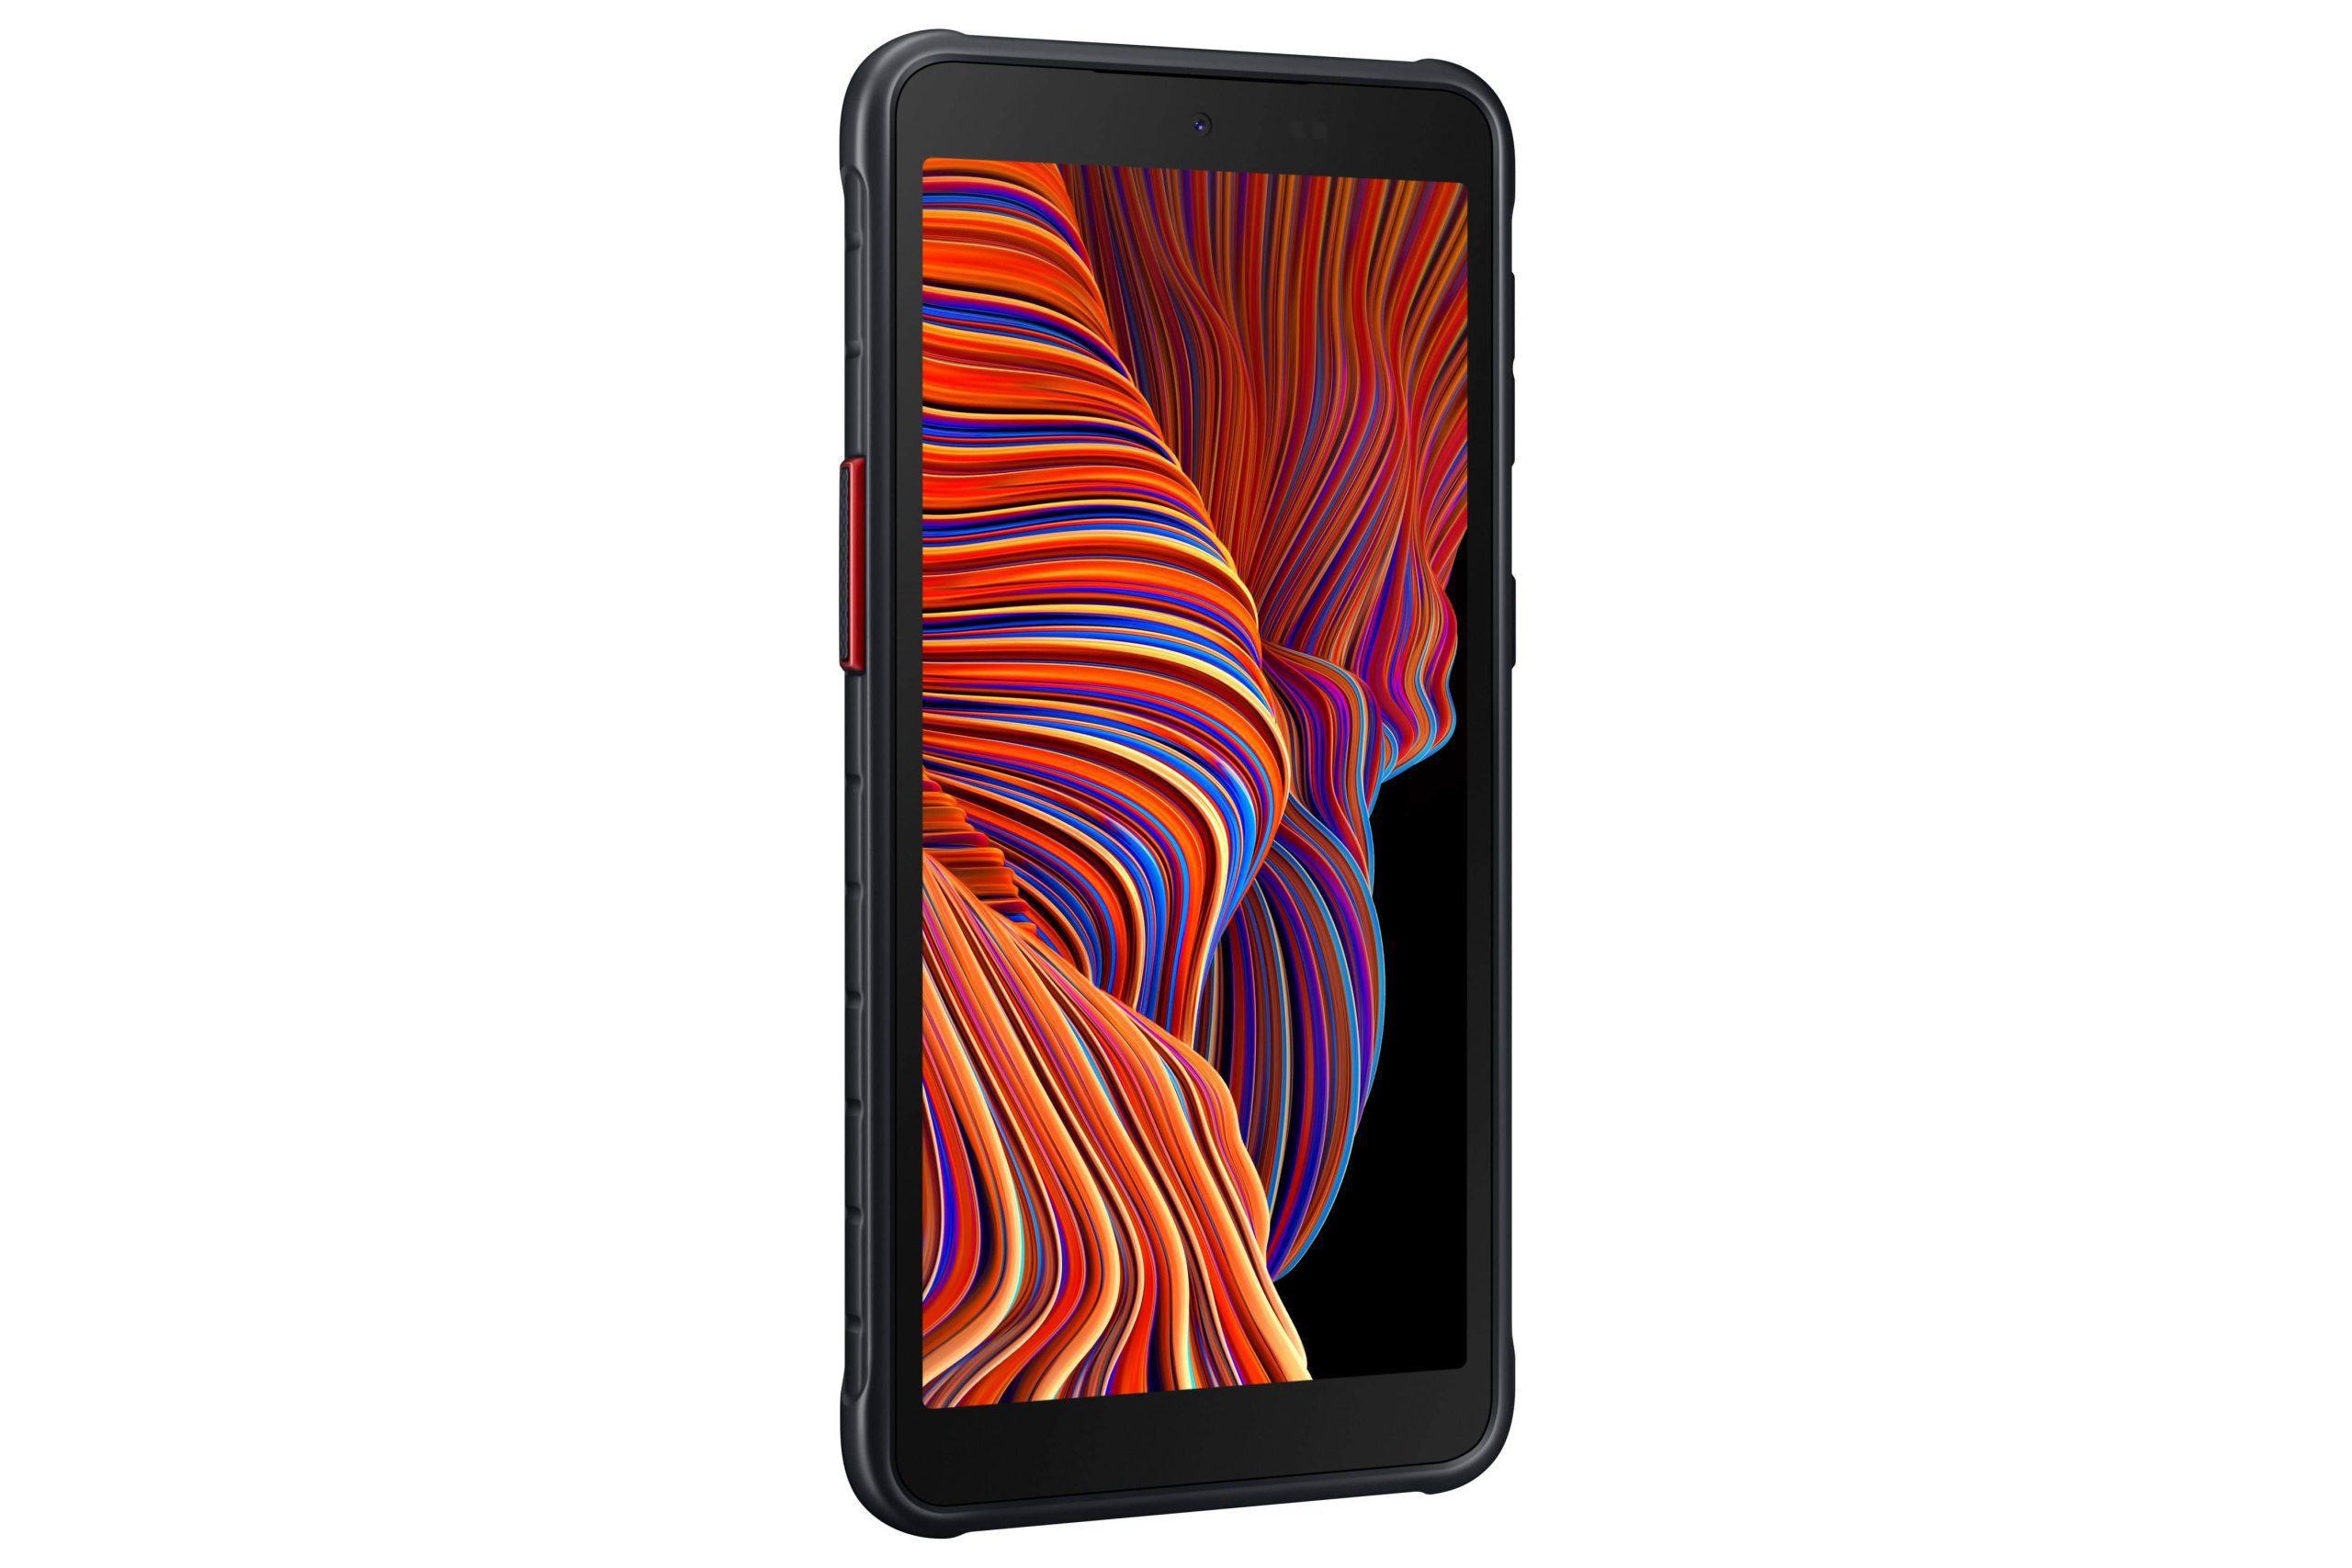 Nuovo Smartphone_Samsung__XCover_Perspective_Black-